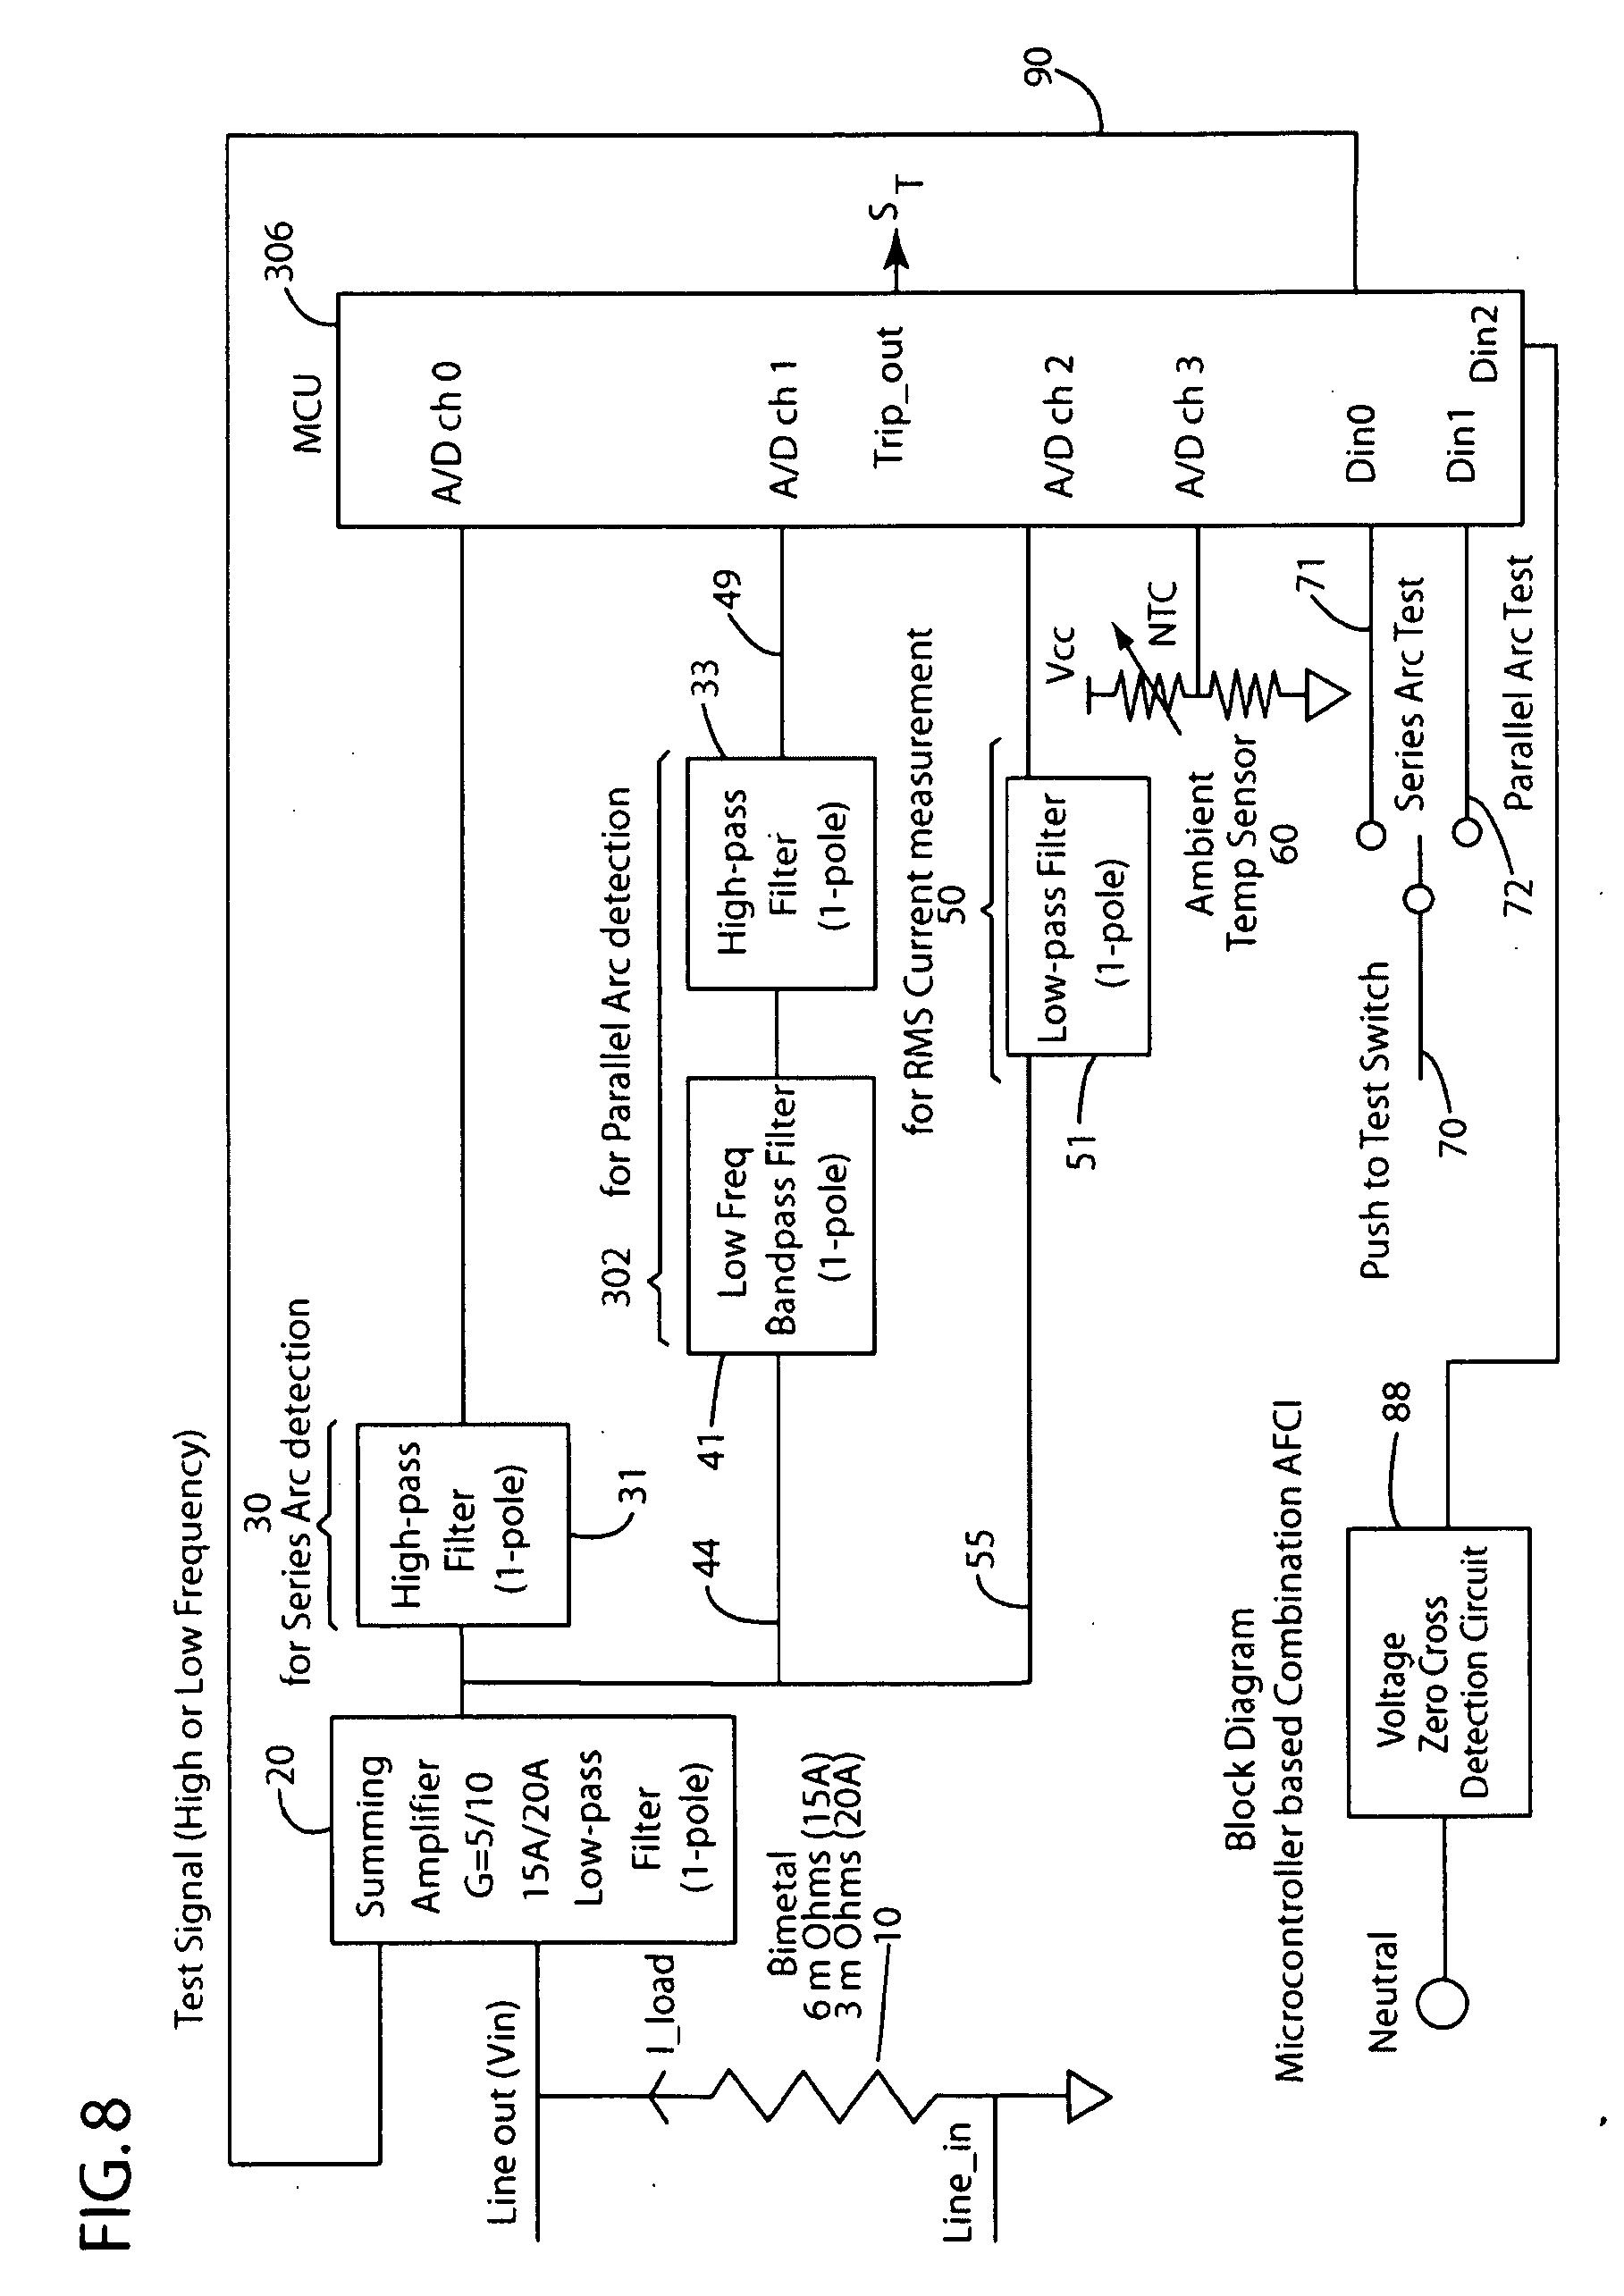 Patent Us20100165521 Parallel Arc Detection Using Discrete Wavelet Pass Seymour Arcfault Circuit Interrupter Afci Drawing